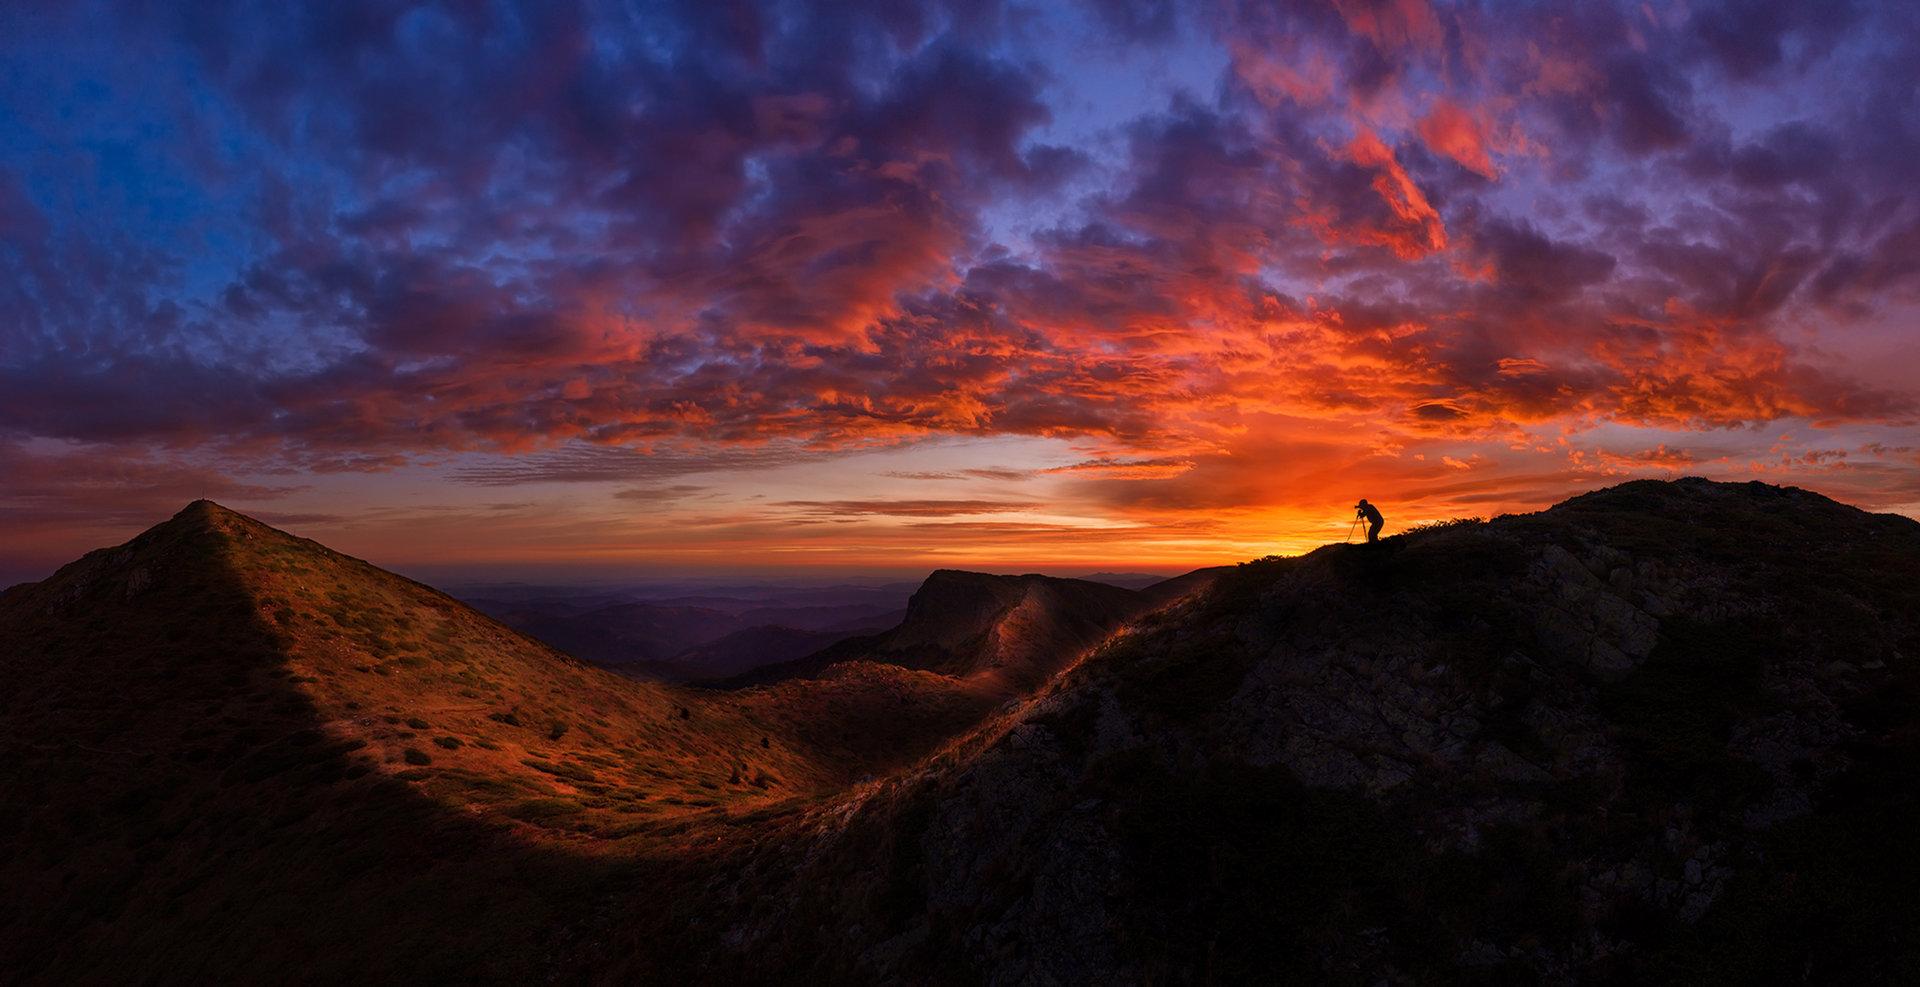 Photo in Panorama | Author Минко | PHOTO FORUM